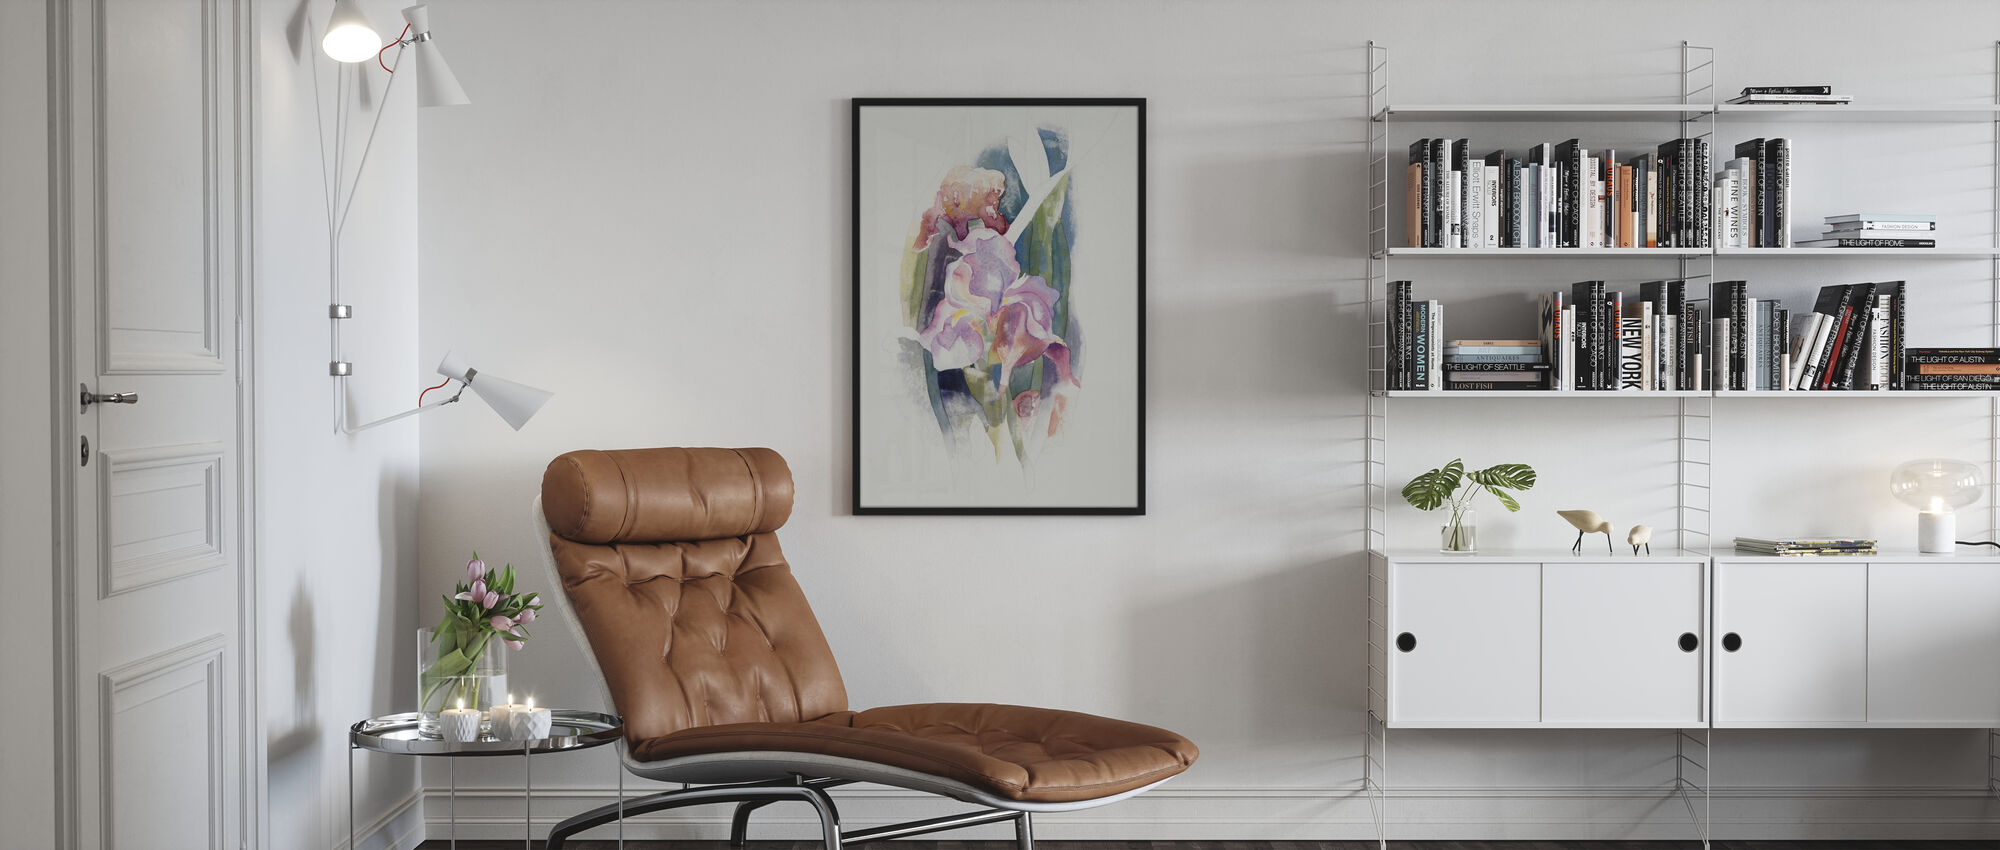 Lila Iris - Poster - Wohnzimmer